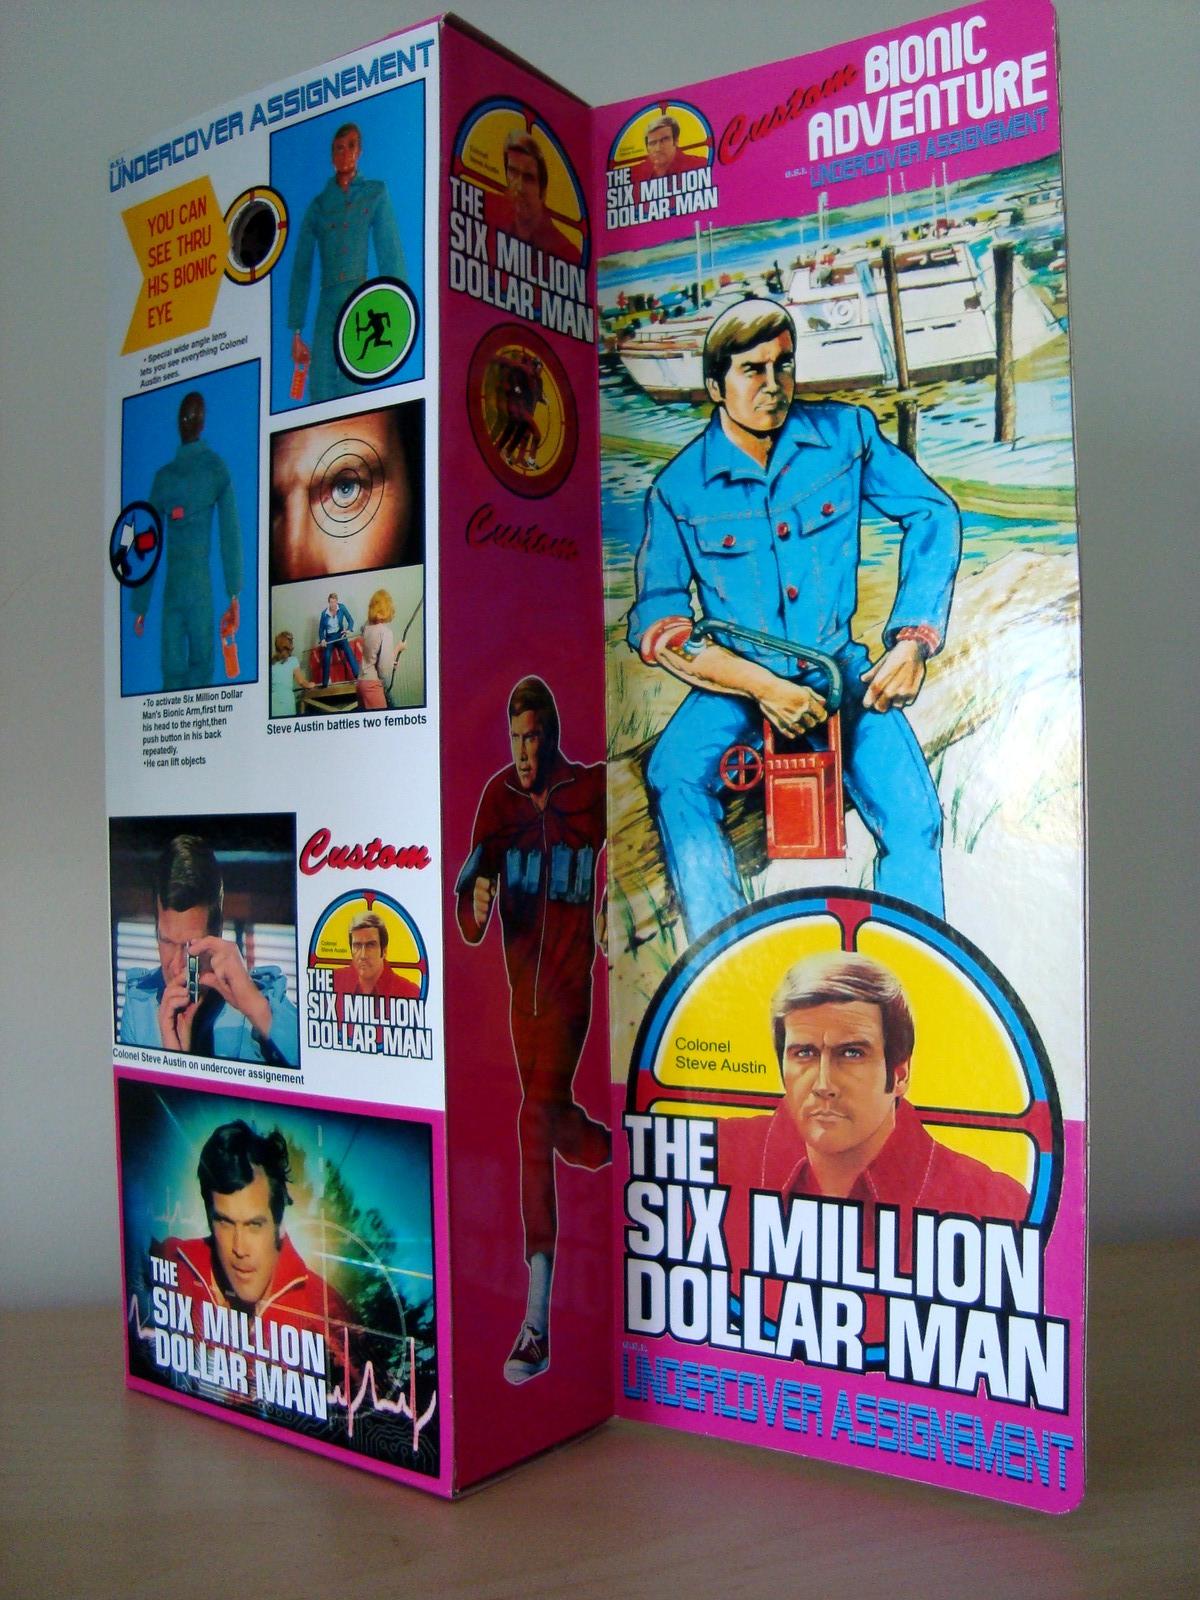 Steve Austin L'homme qui valait 3 milliards - KENNER MECCANO - Page 11 170629071249776043